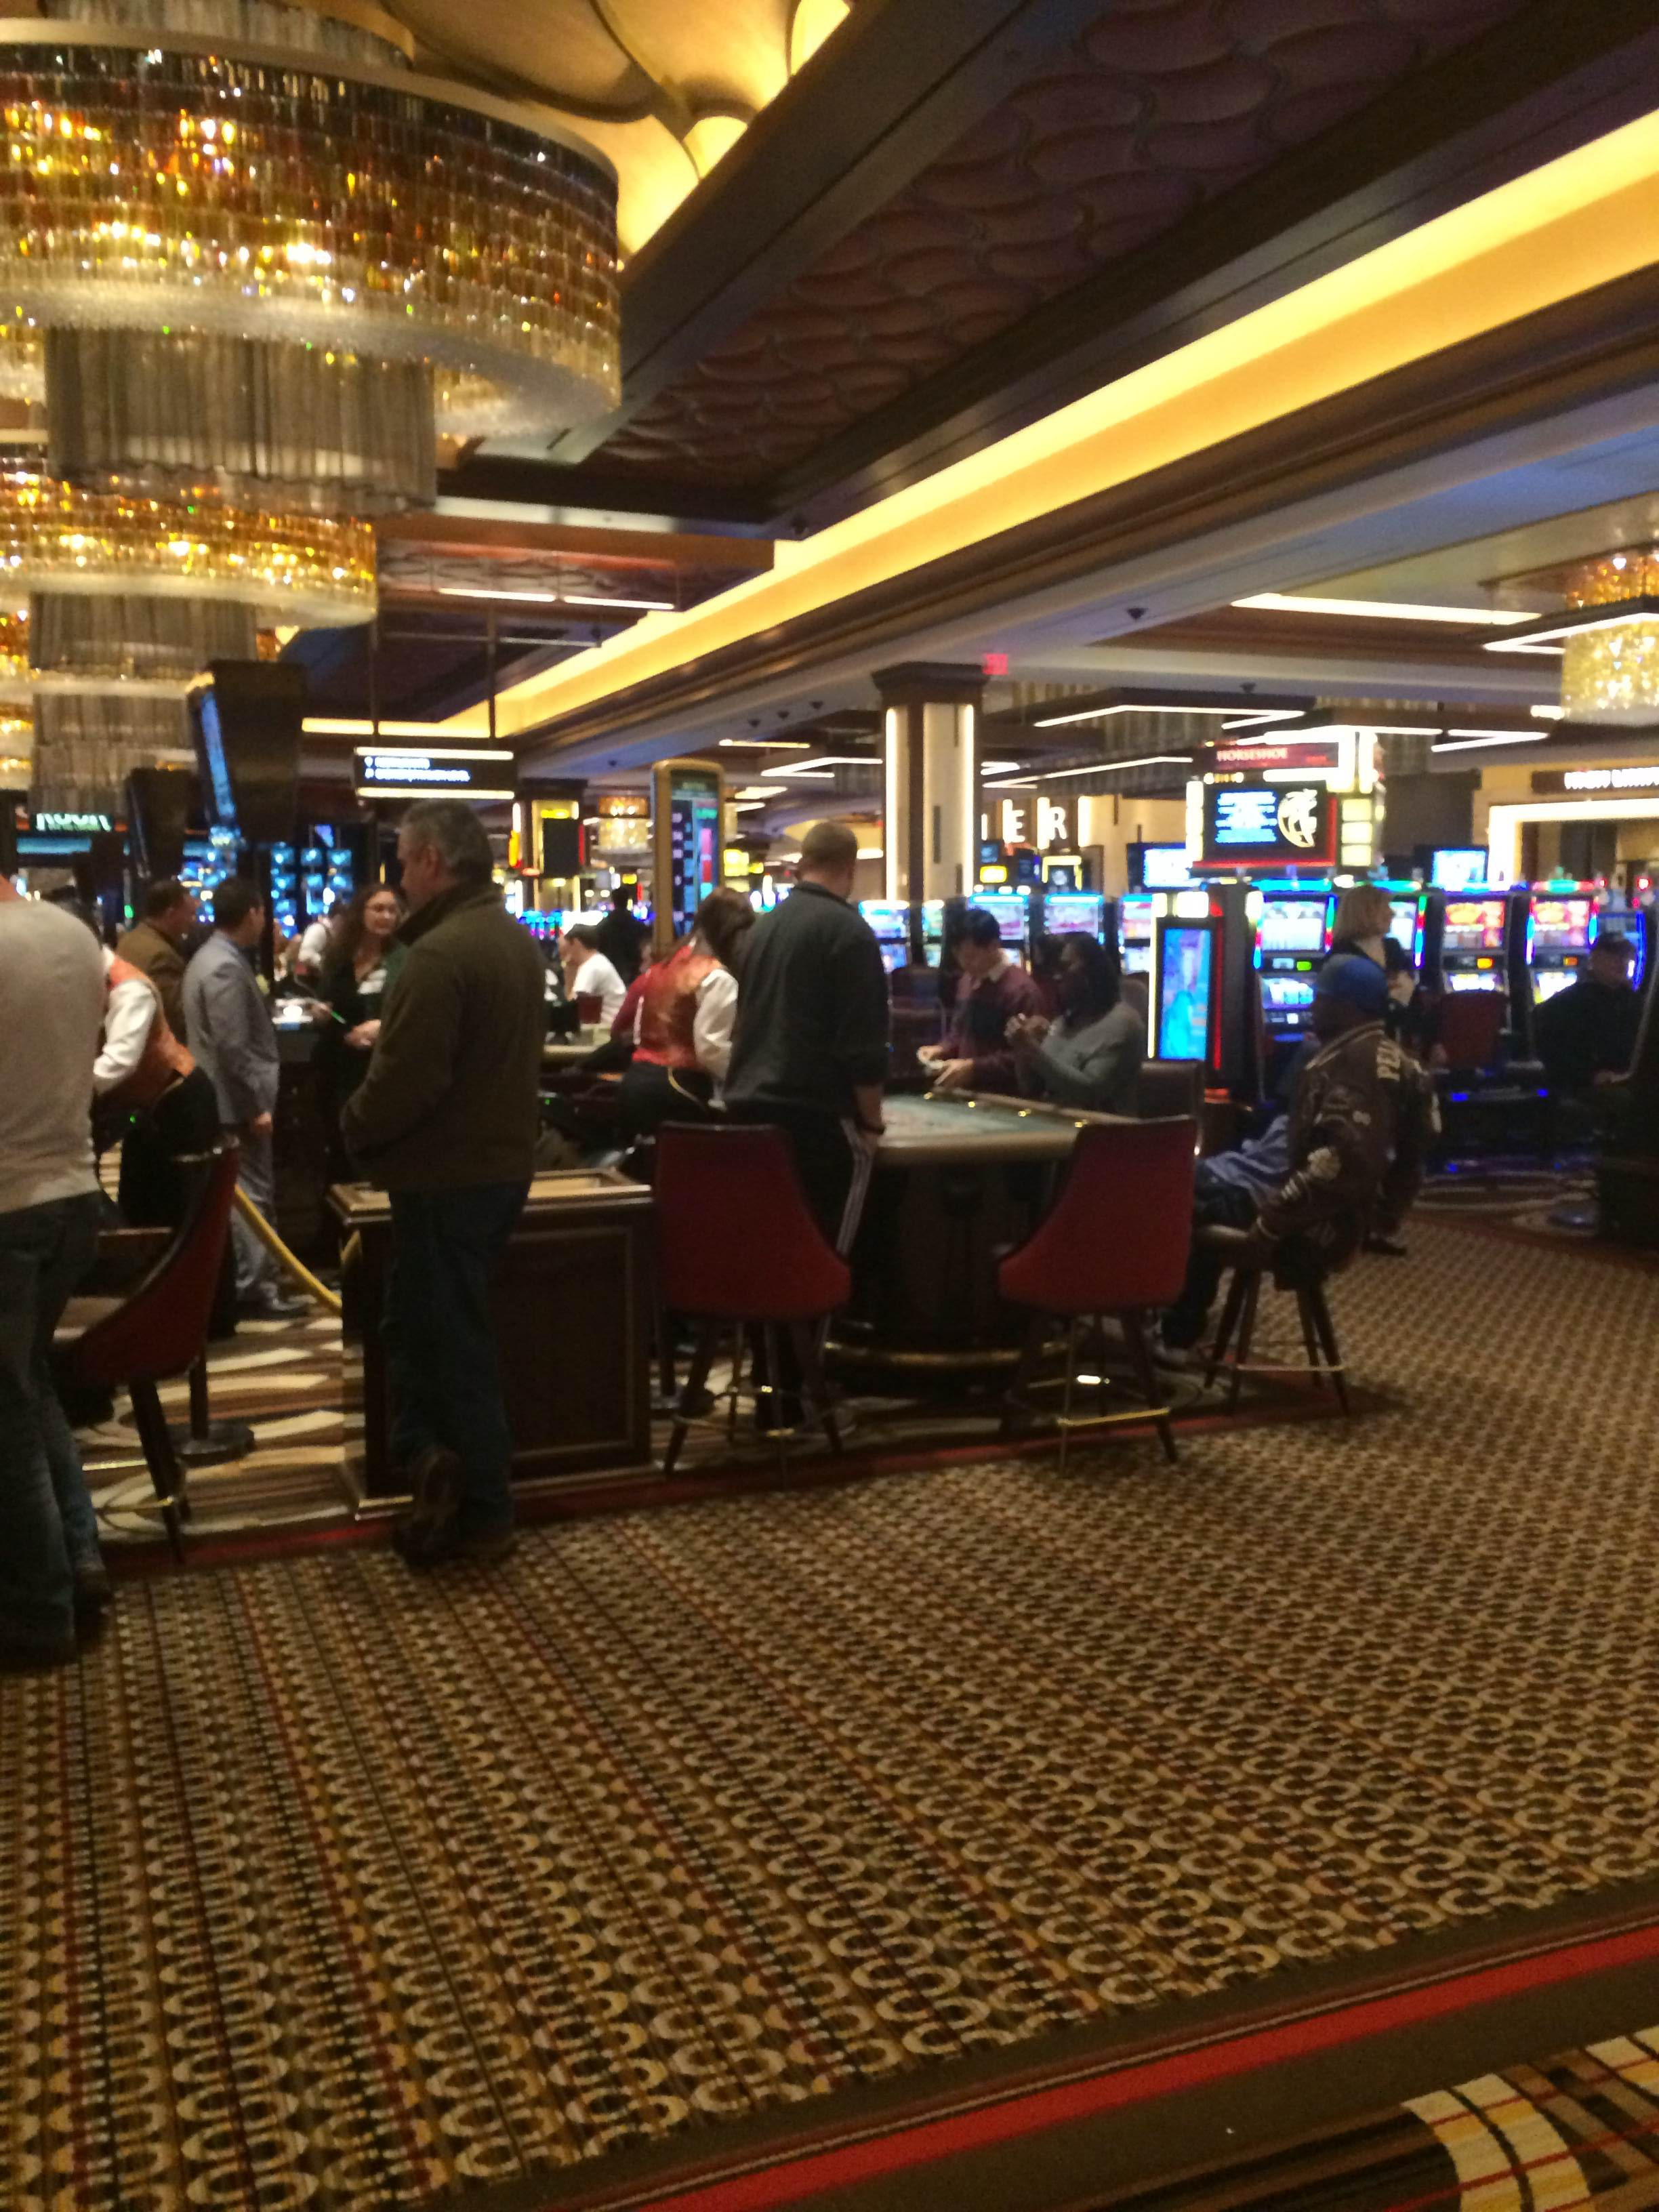 Grand casino barge hands on gambling revenue remains revelant